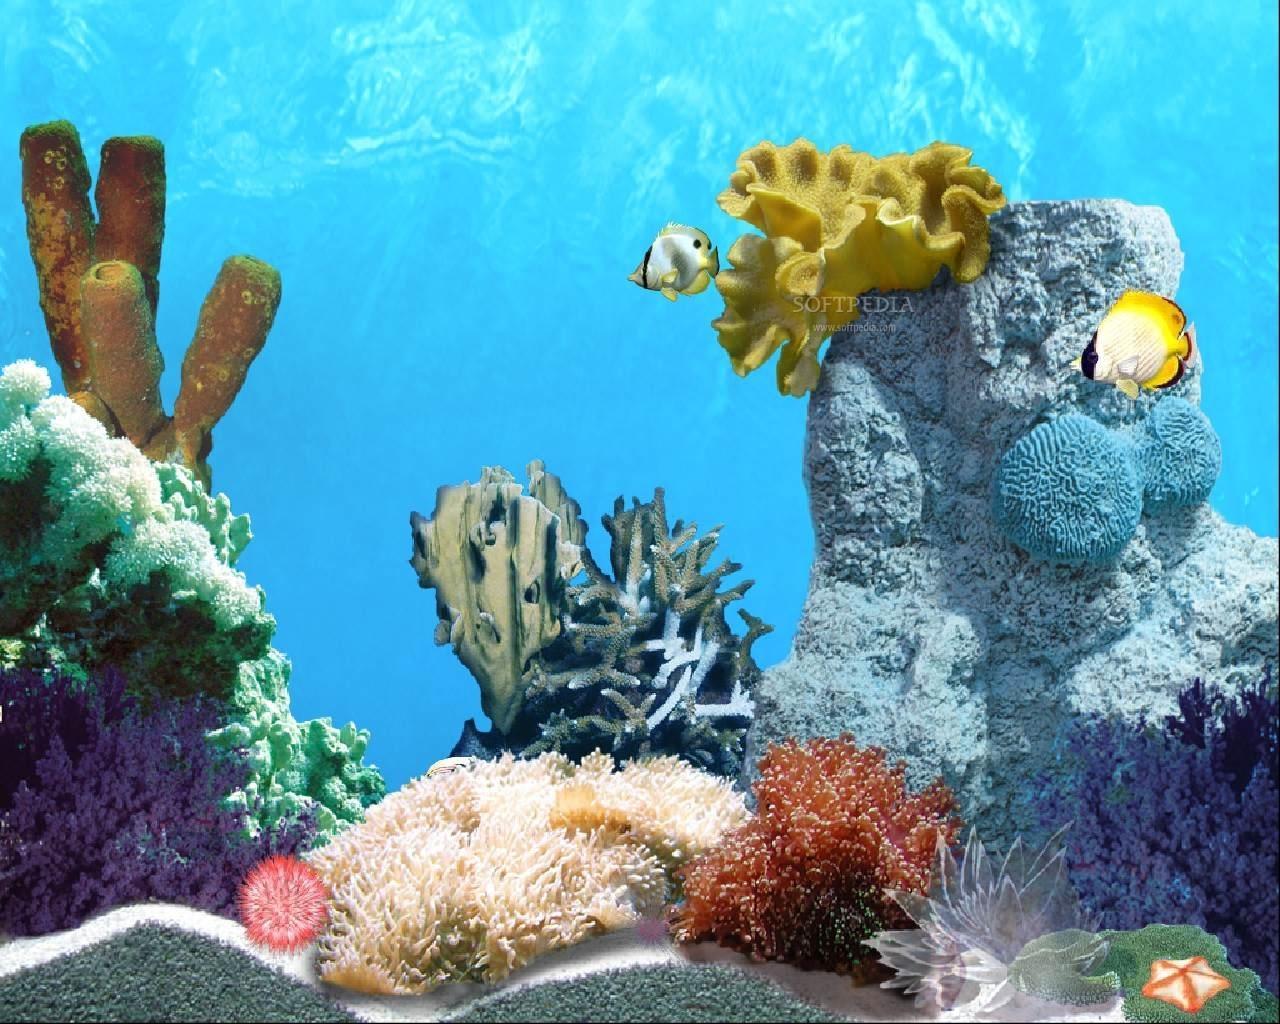 Fish Mobile Wallpaper - Animated Fish Backgrounds For Desktop - HD Wallpaper